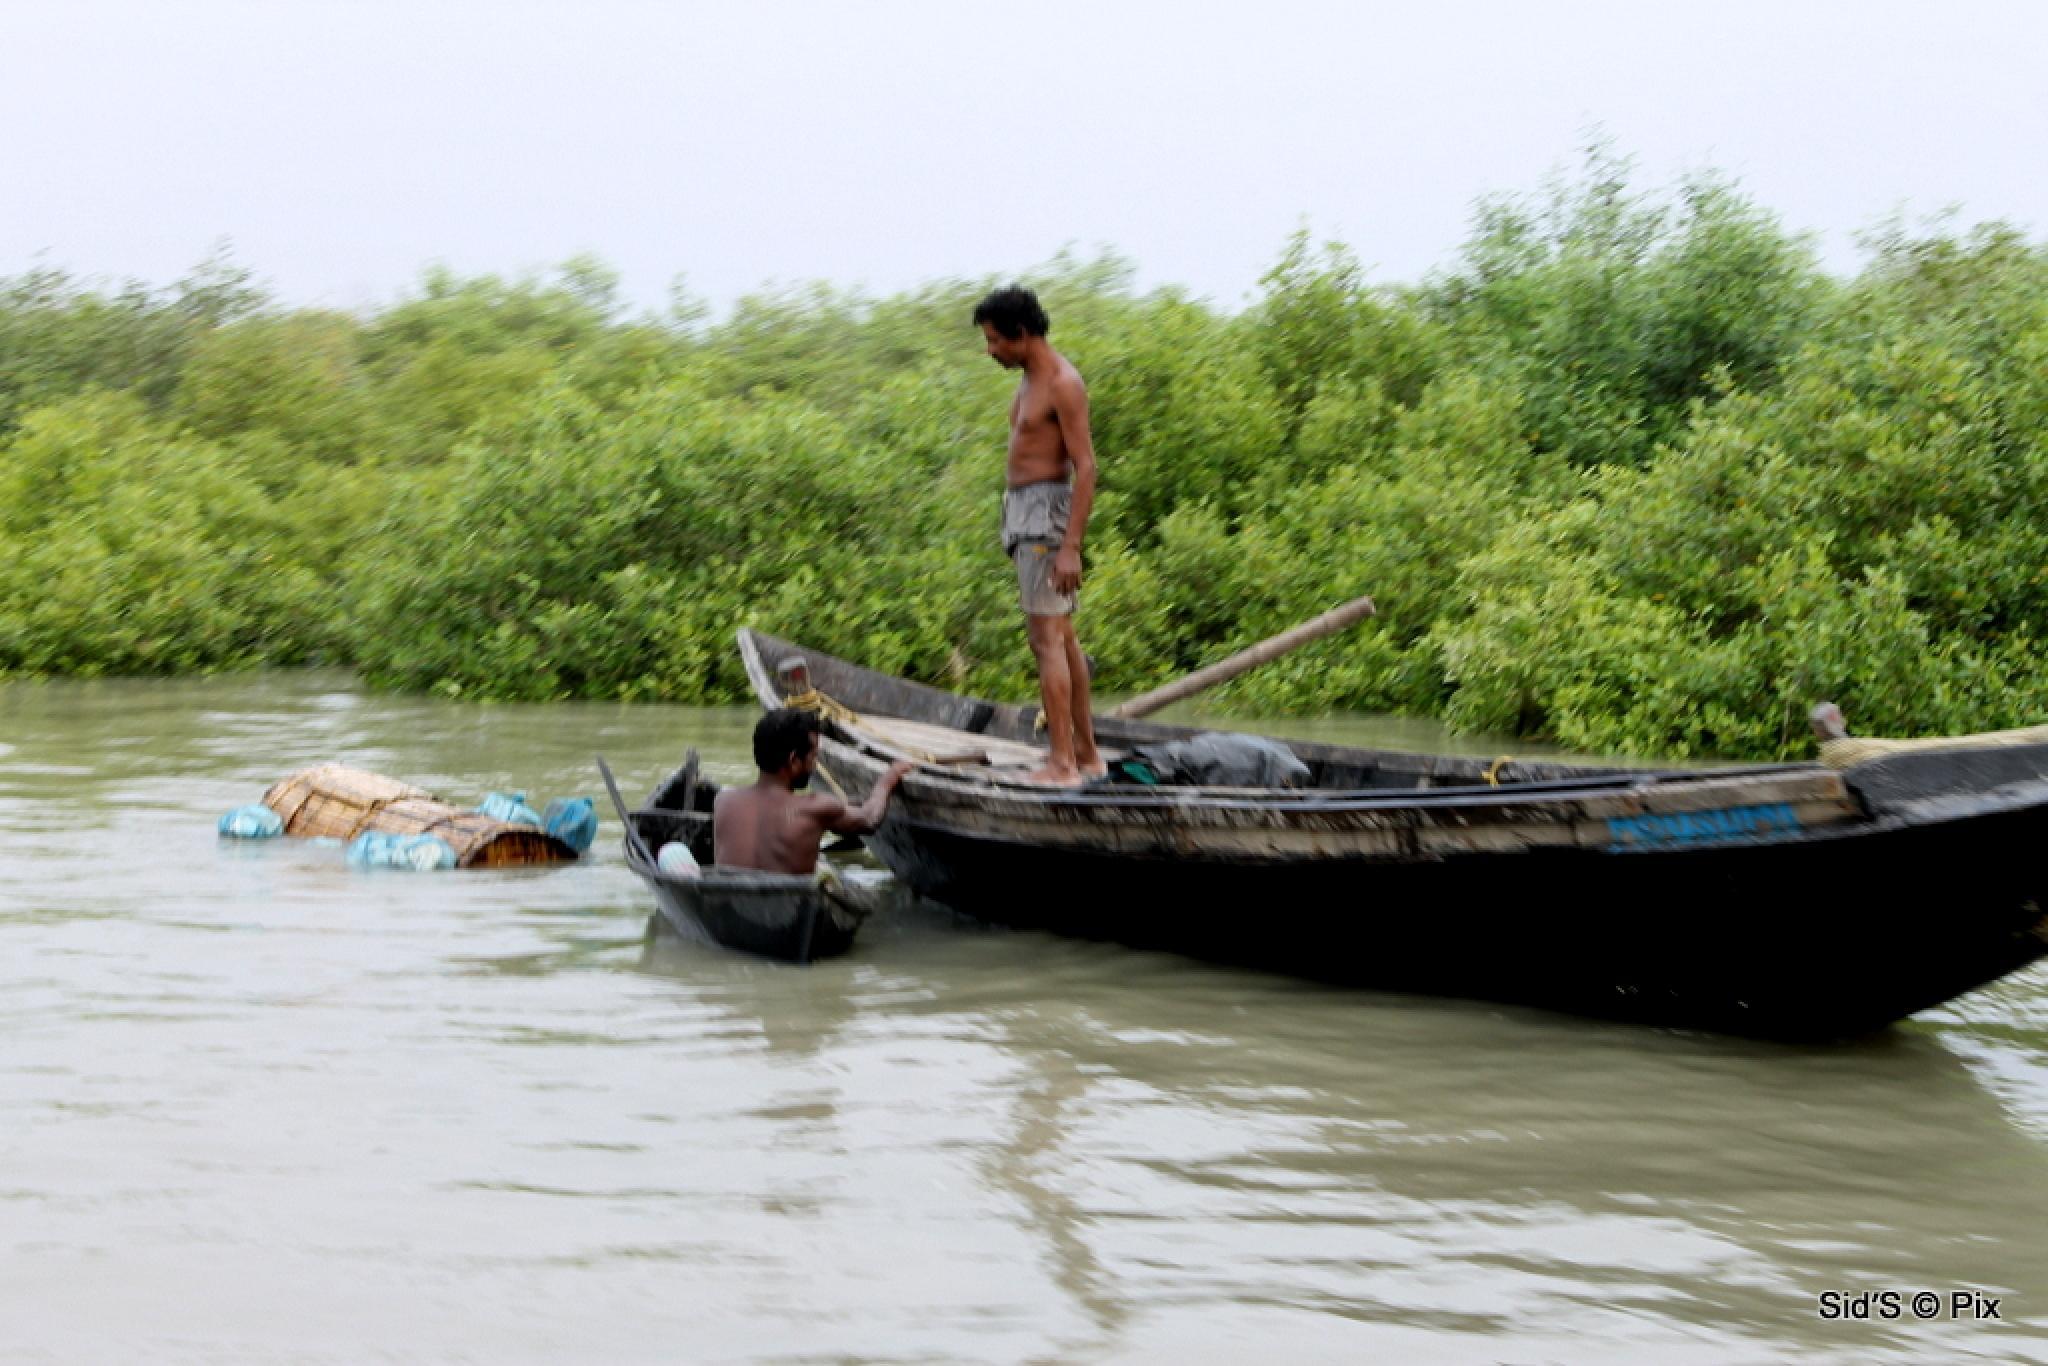 Big Boat Small Boat by Siddharth Sanyal